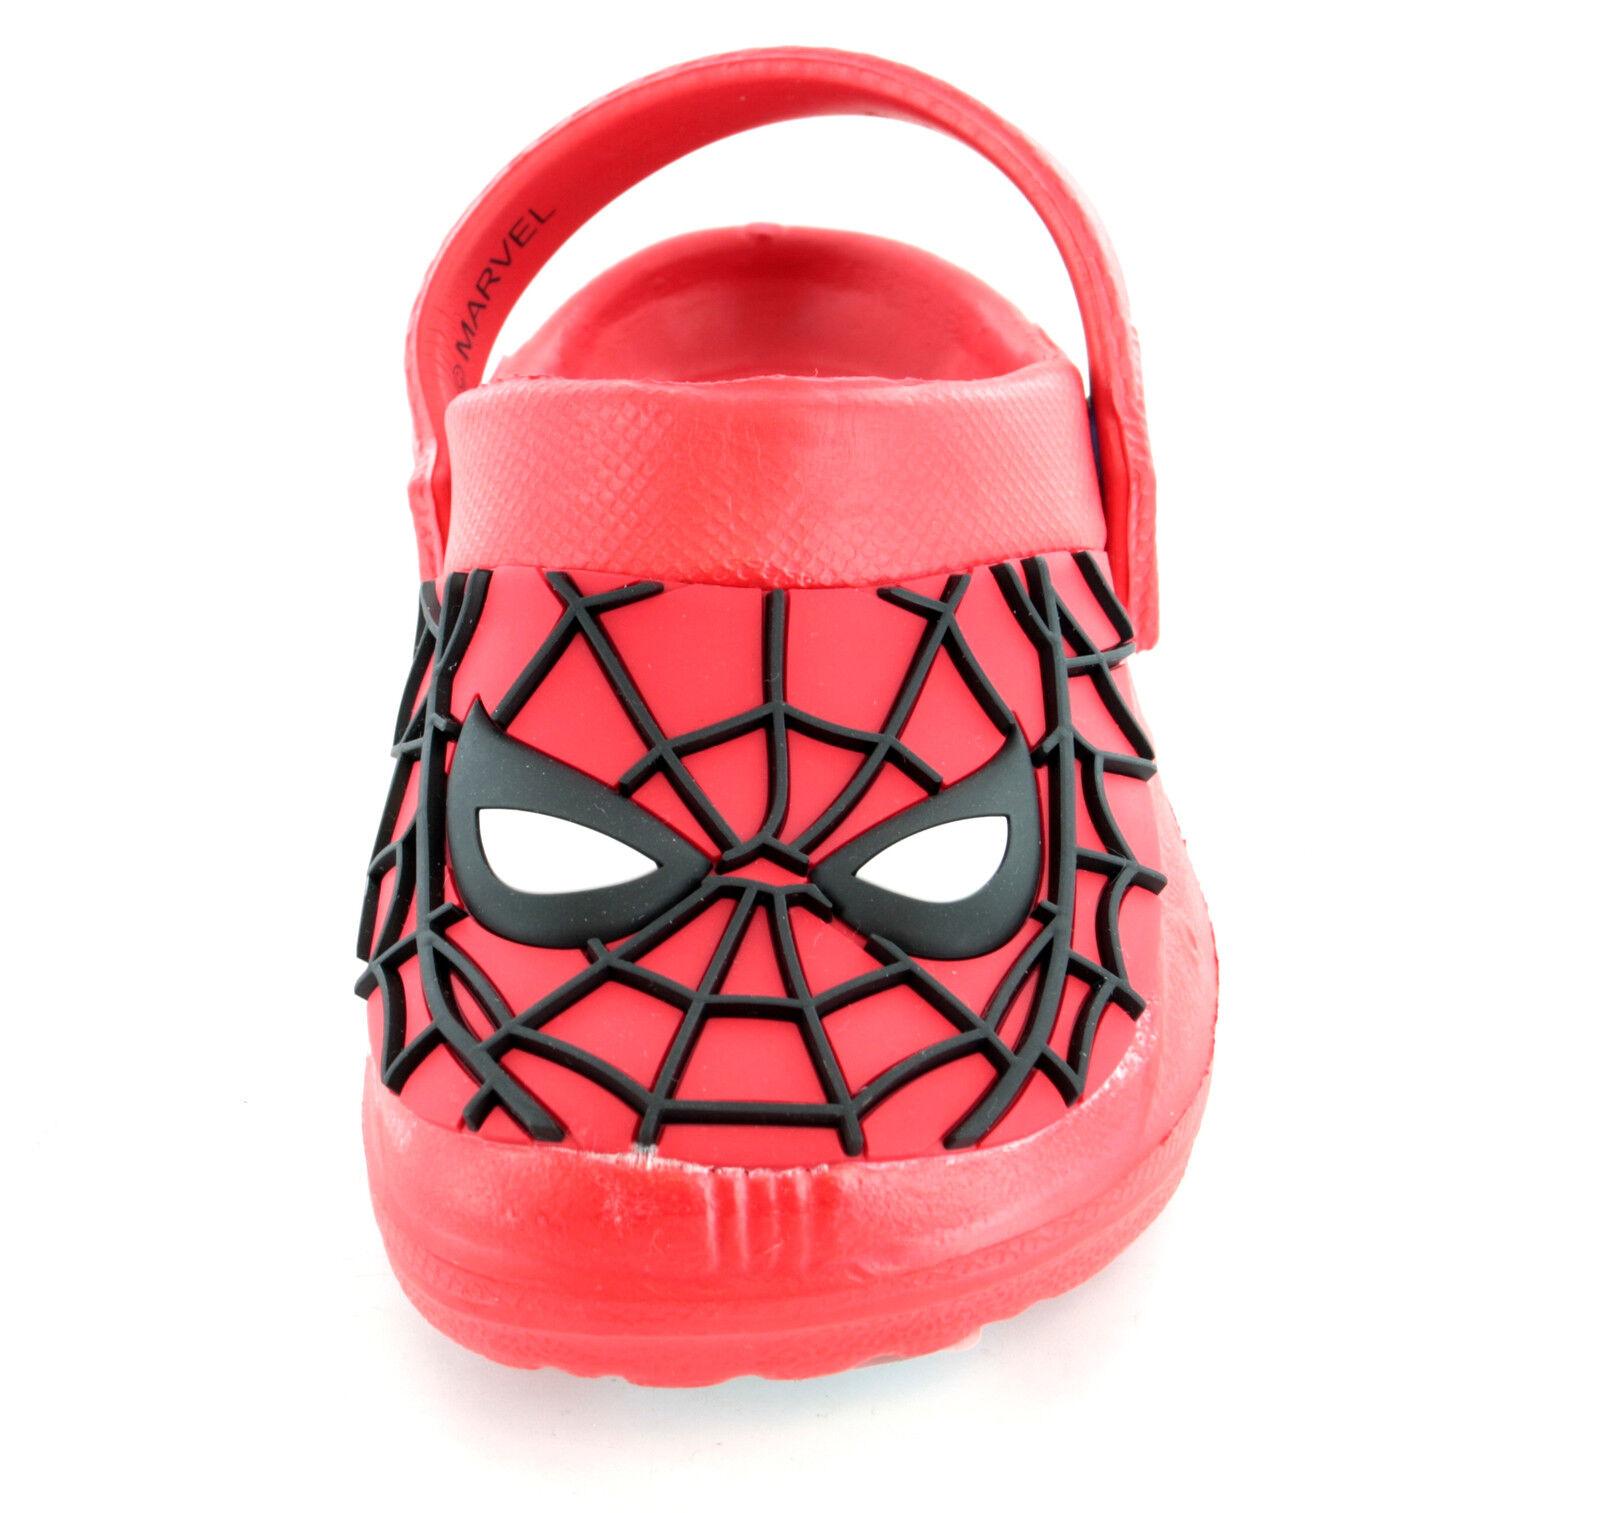 Boys Marvel Spiderman Clog Flip Flop Sandals Cloggs Toddler Children Size 6-12